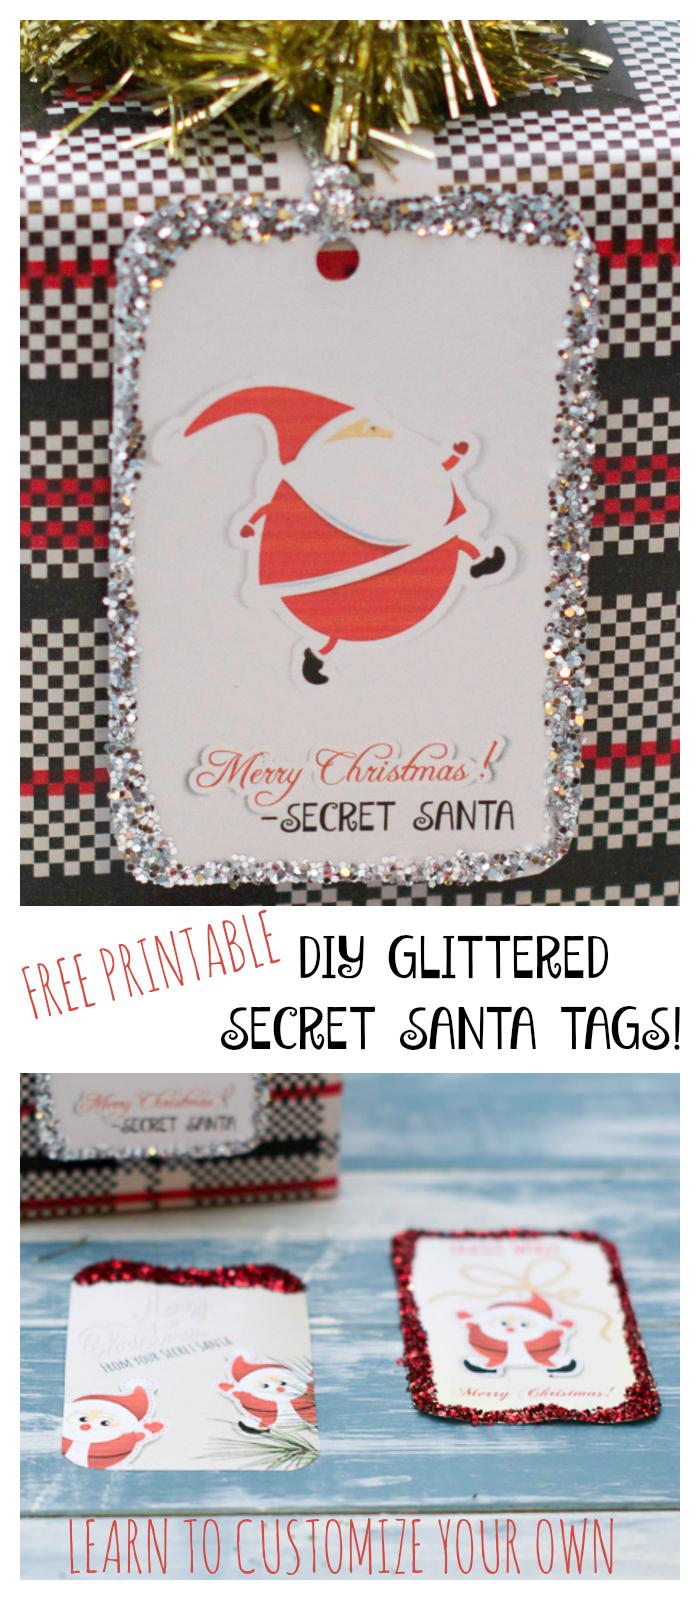 photograph regarding Secret Santa Printable titled Printable Glittered Magic formula Santa Reward Tags - Biggest Hoff